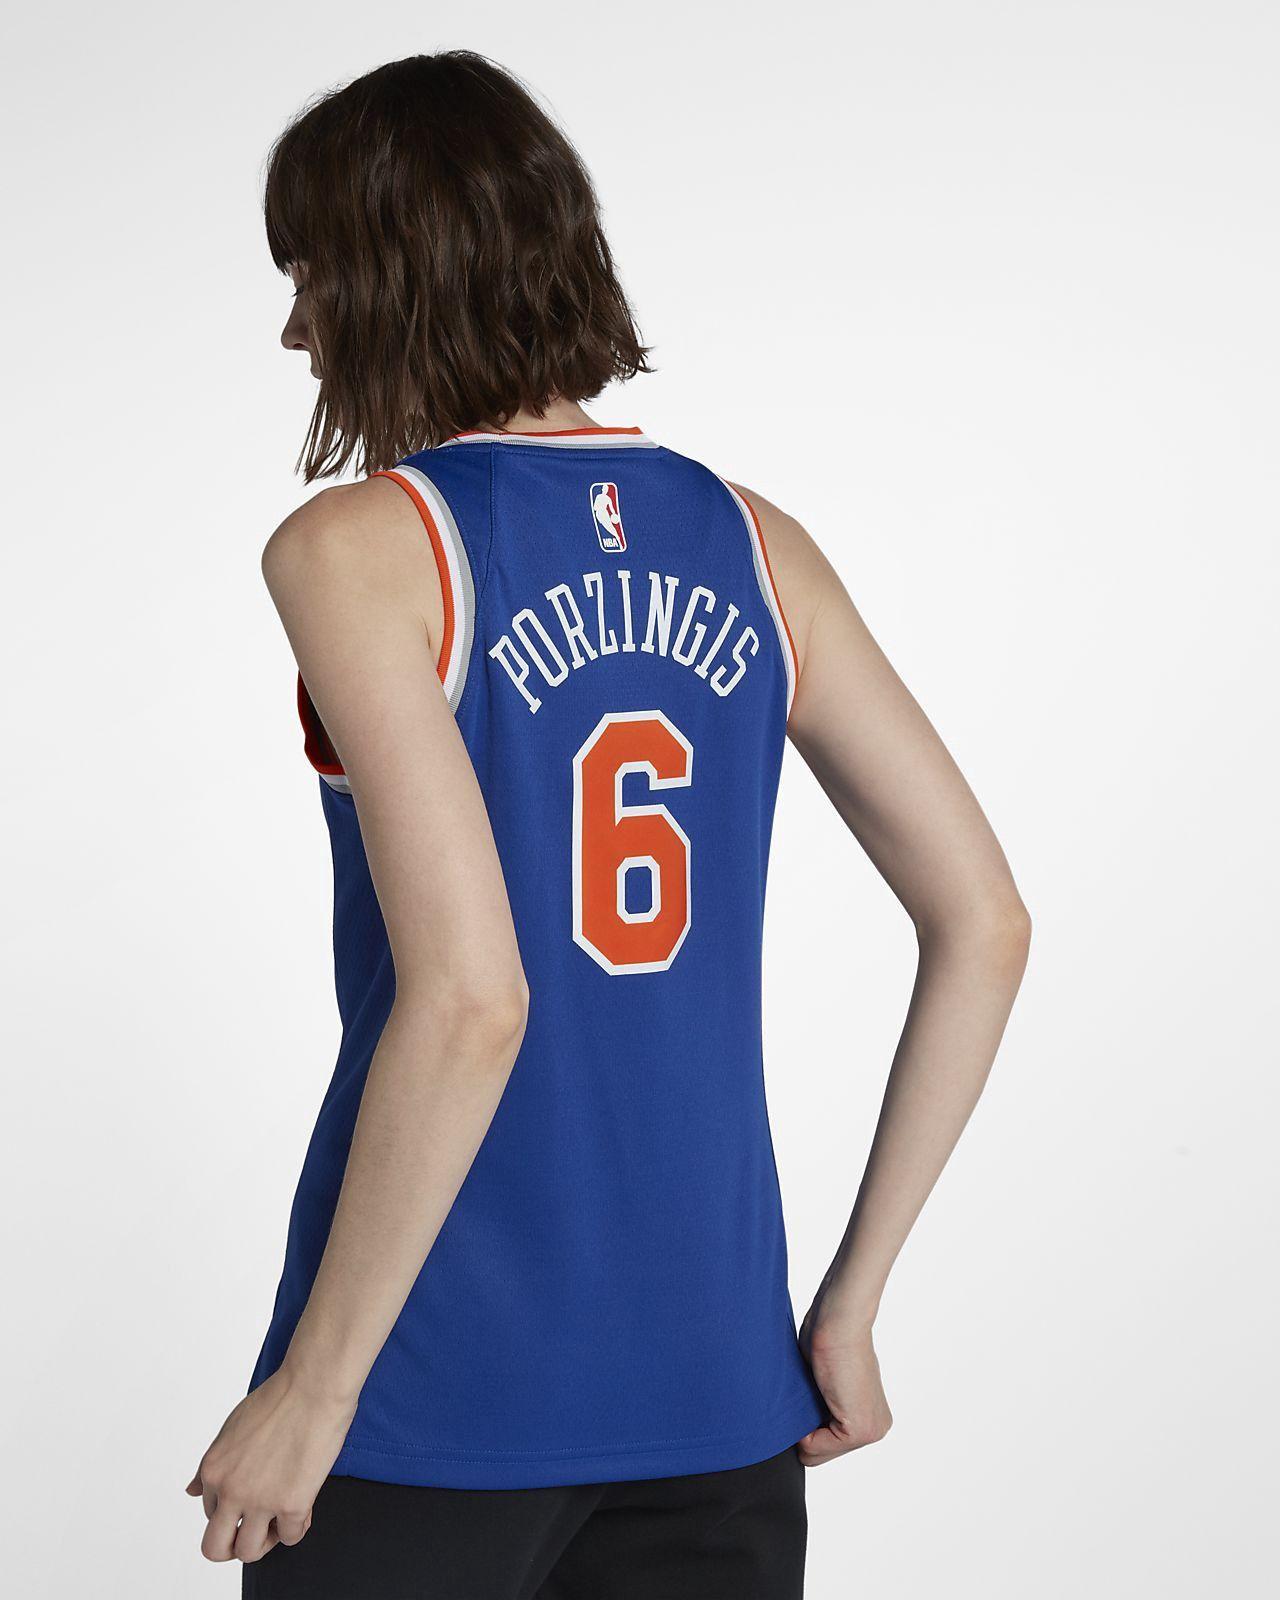 Nike Kristaps Porzingis Icon Edition Swingman Jersey (New York Knicks)  Women s Nba Connected - Xl (16–18) Blue 3861a6fee6